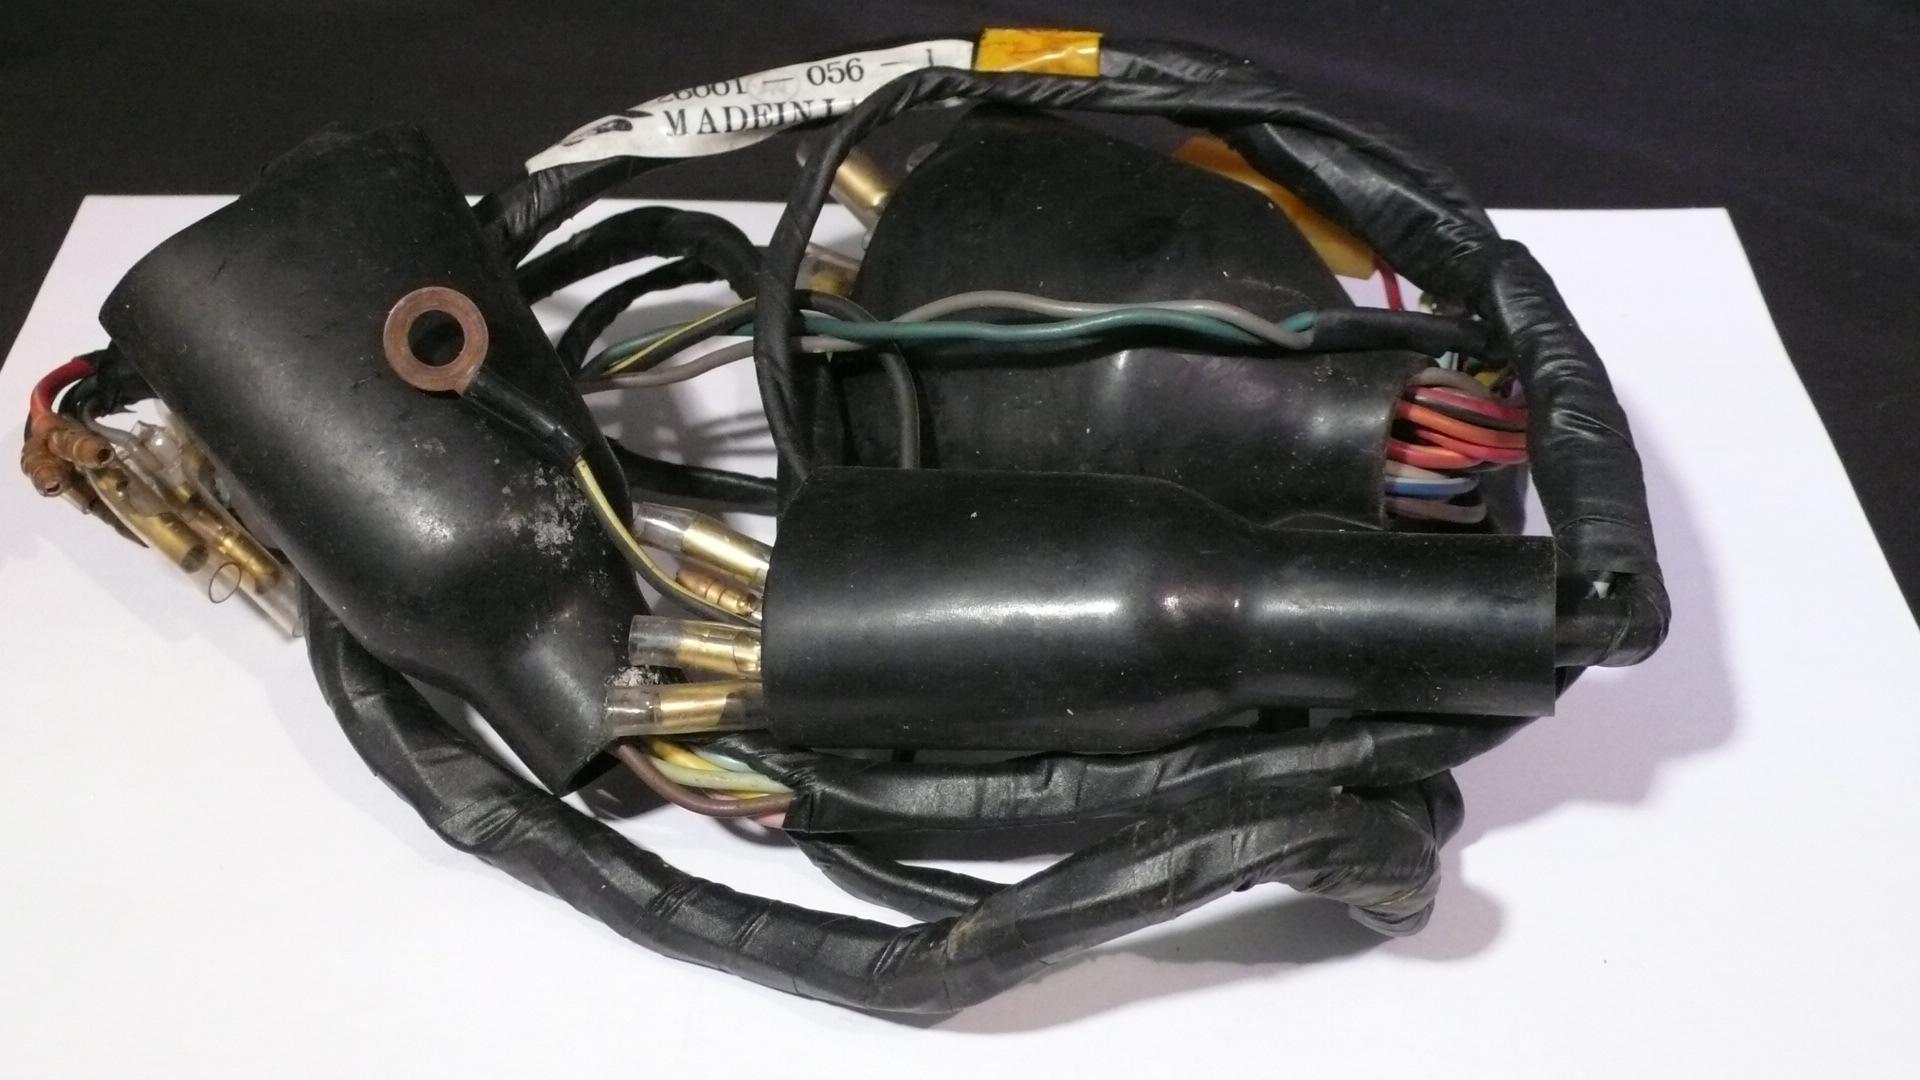 Balancer Chain Guide Kz400 B1b2c1h1kz440 A1a2a3 2500 Kz440 Wiring Harness Main